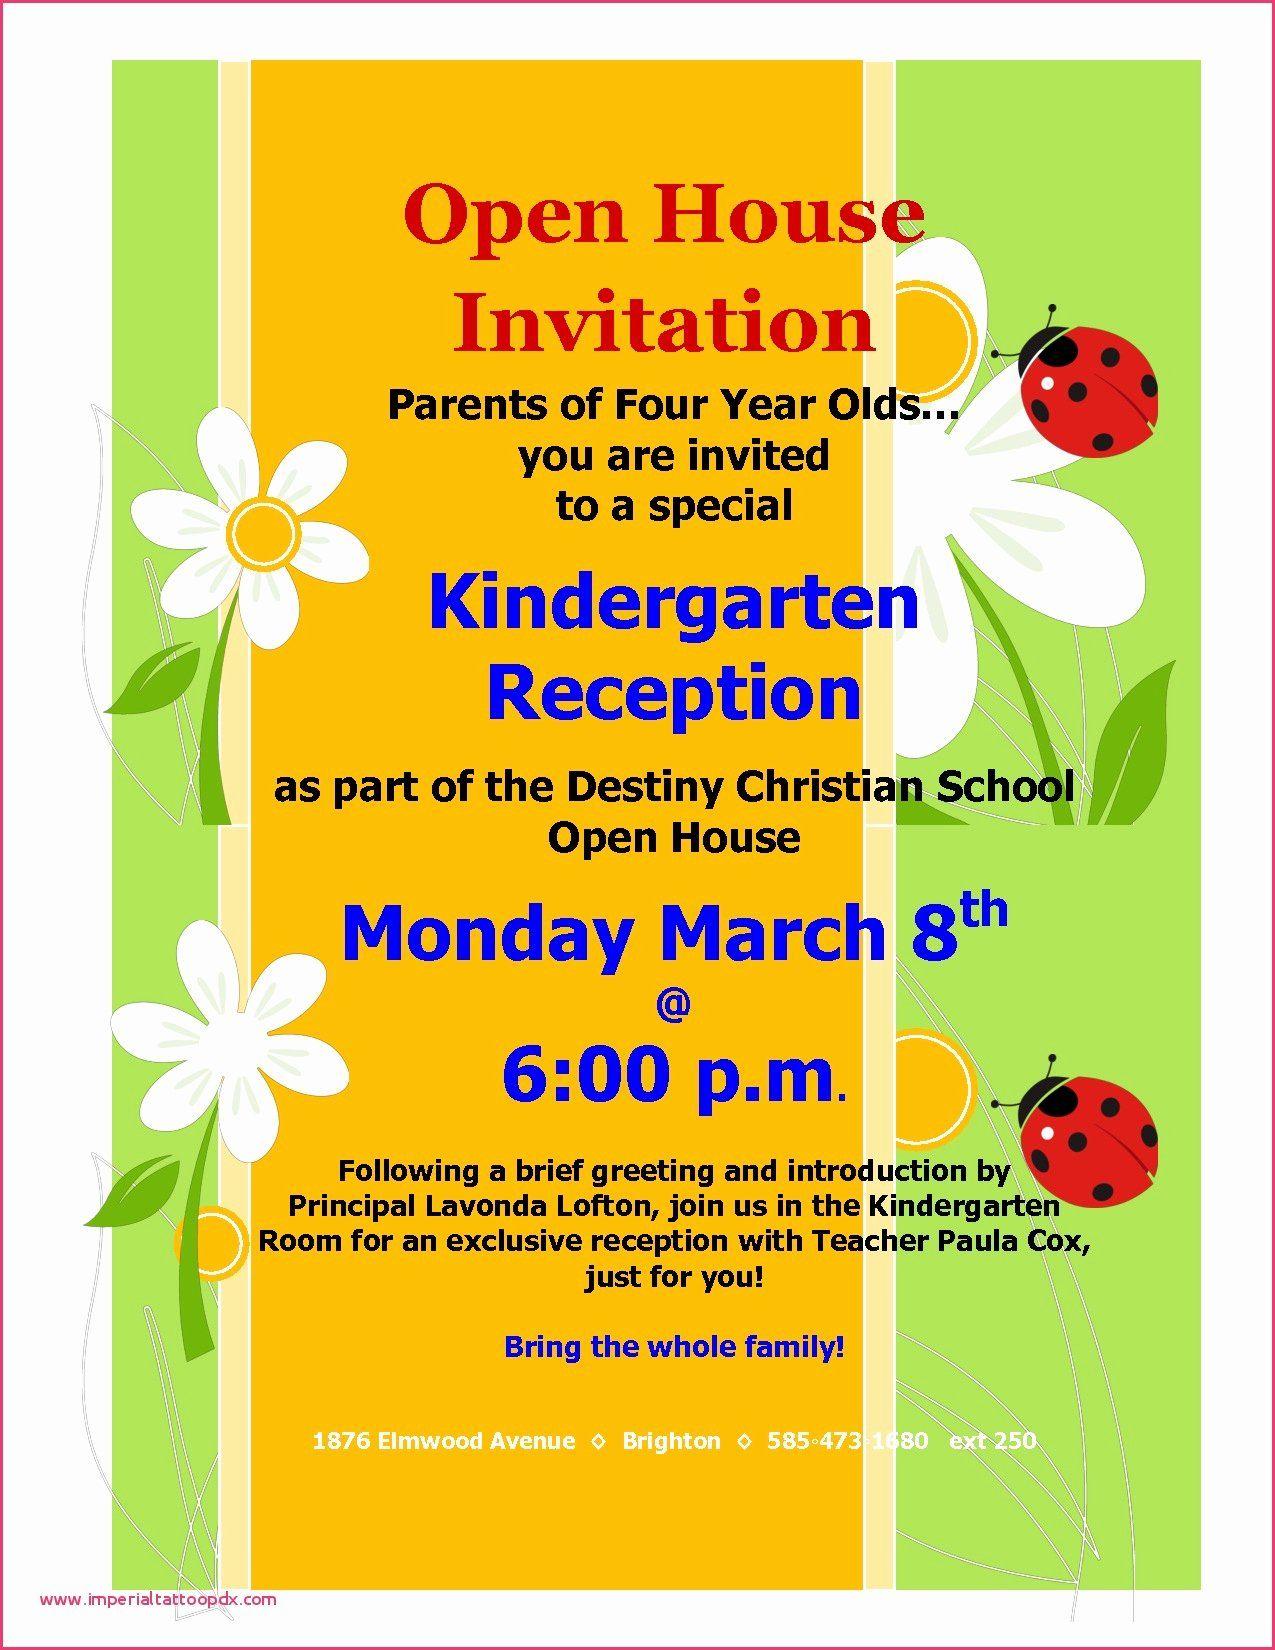 School Open House Invitations Templates Inspirational Invitation Letter Format For Housewa Open House Invitation School Open House Open House Party Invitations